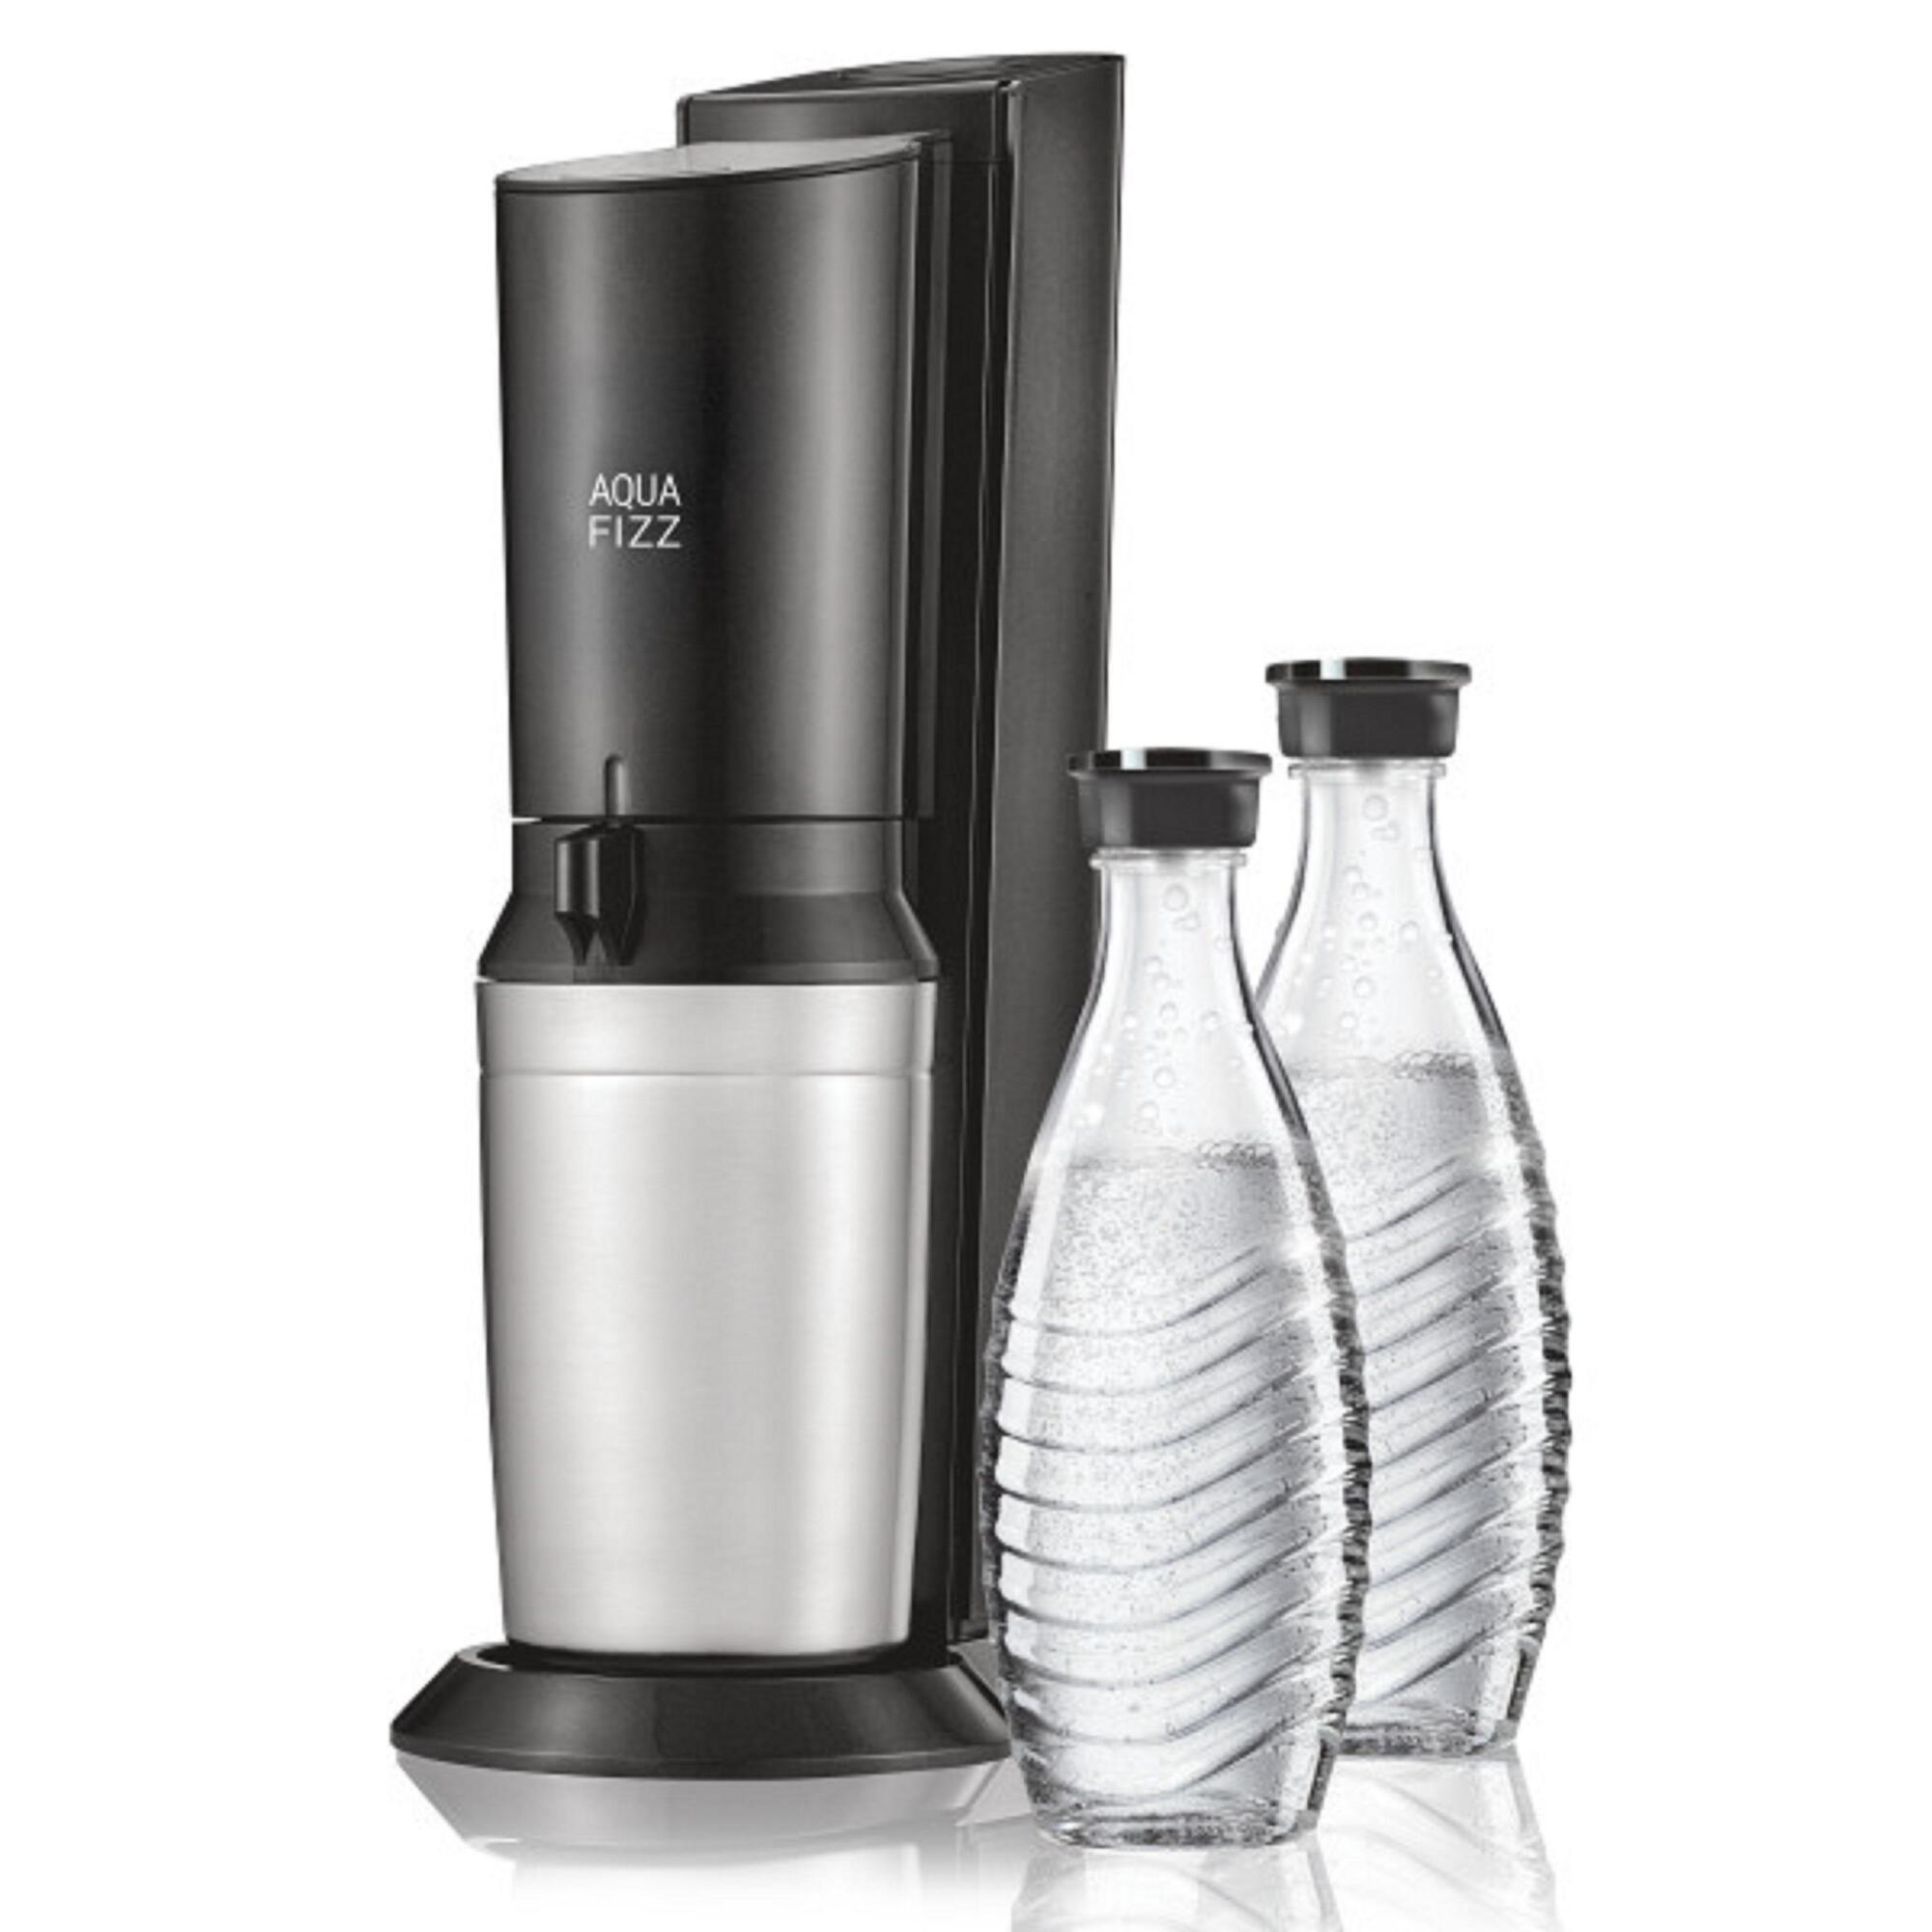 Black Sodastream® Aqua Fizz Sparkling Water Maker Kit $159.99